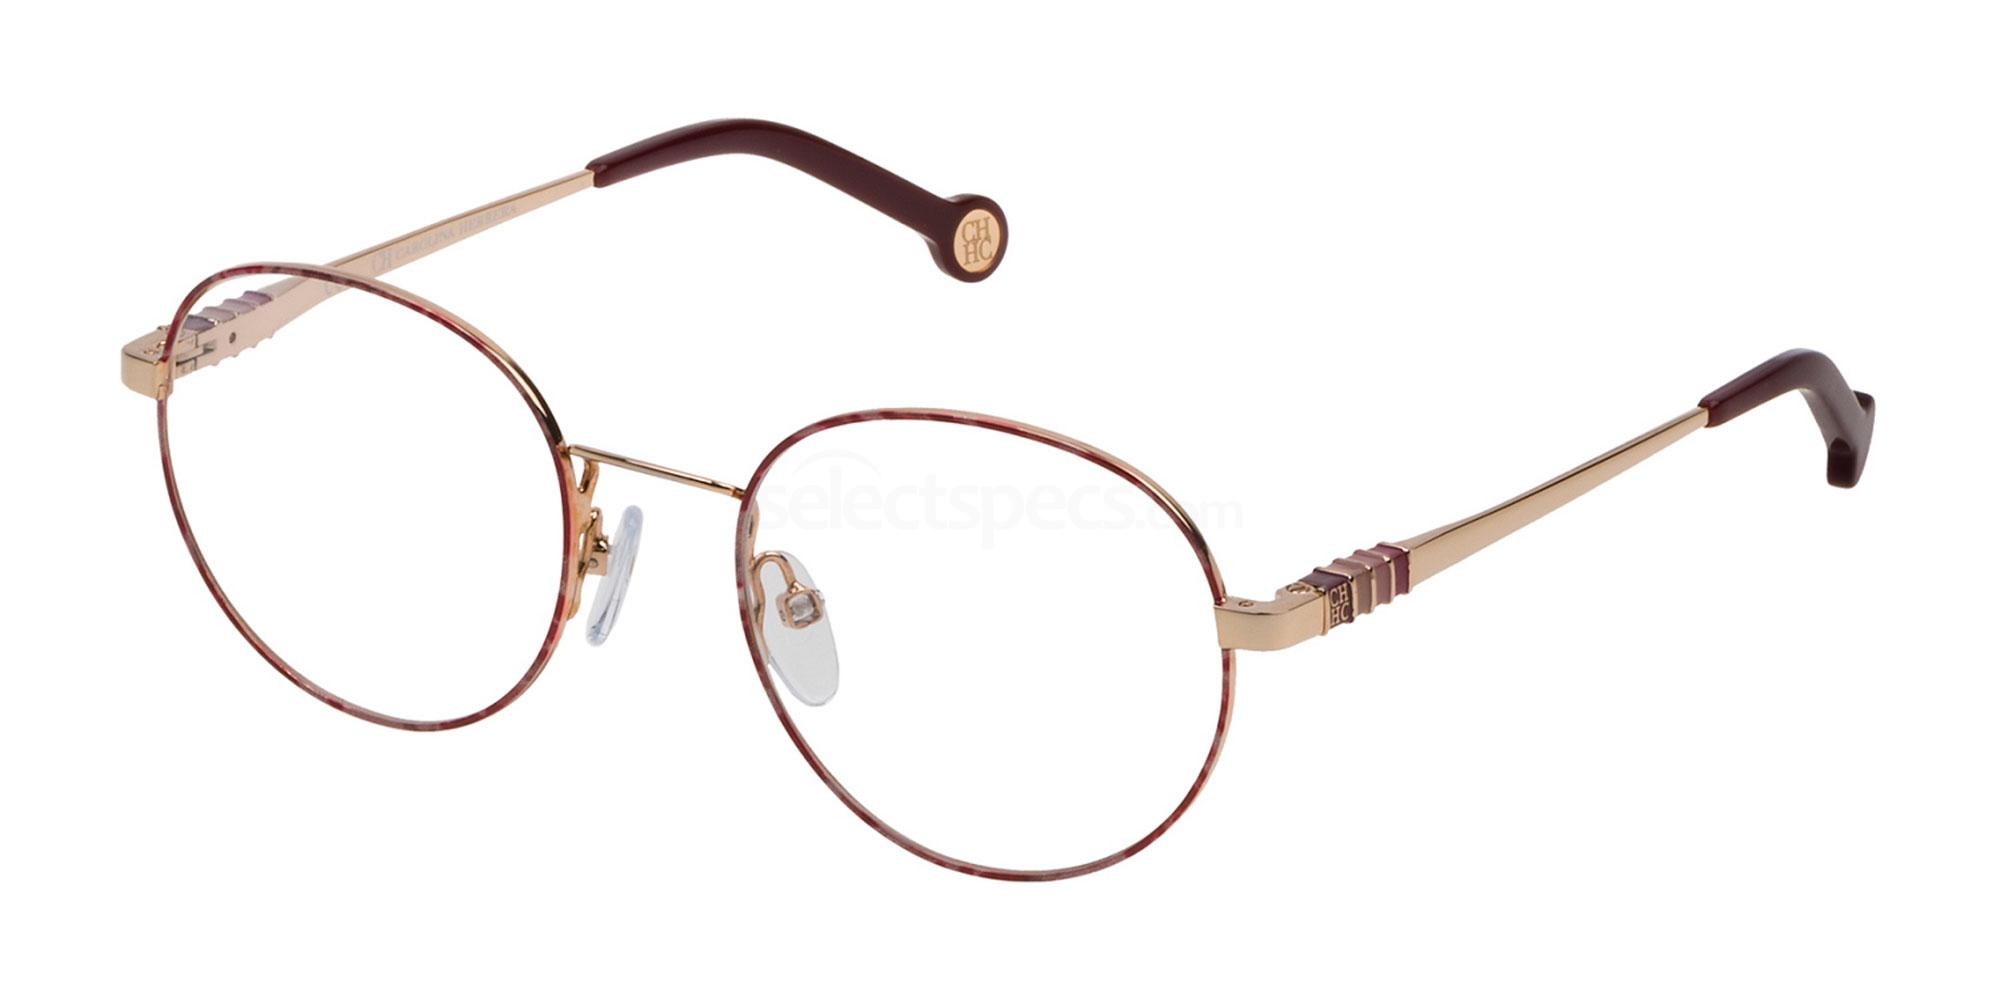 0325 VHE113 Glasses, CH Carolina Herrera